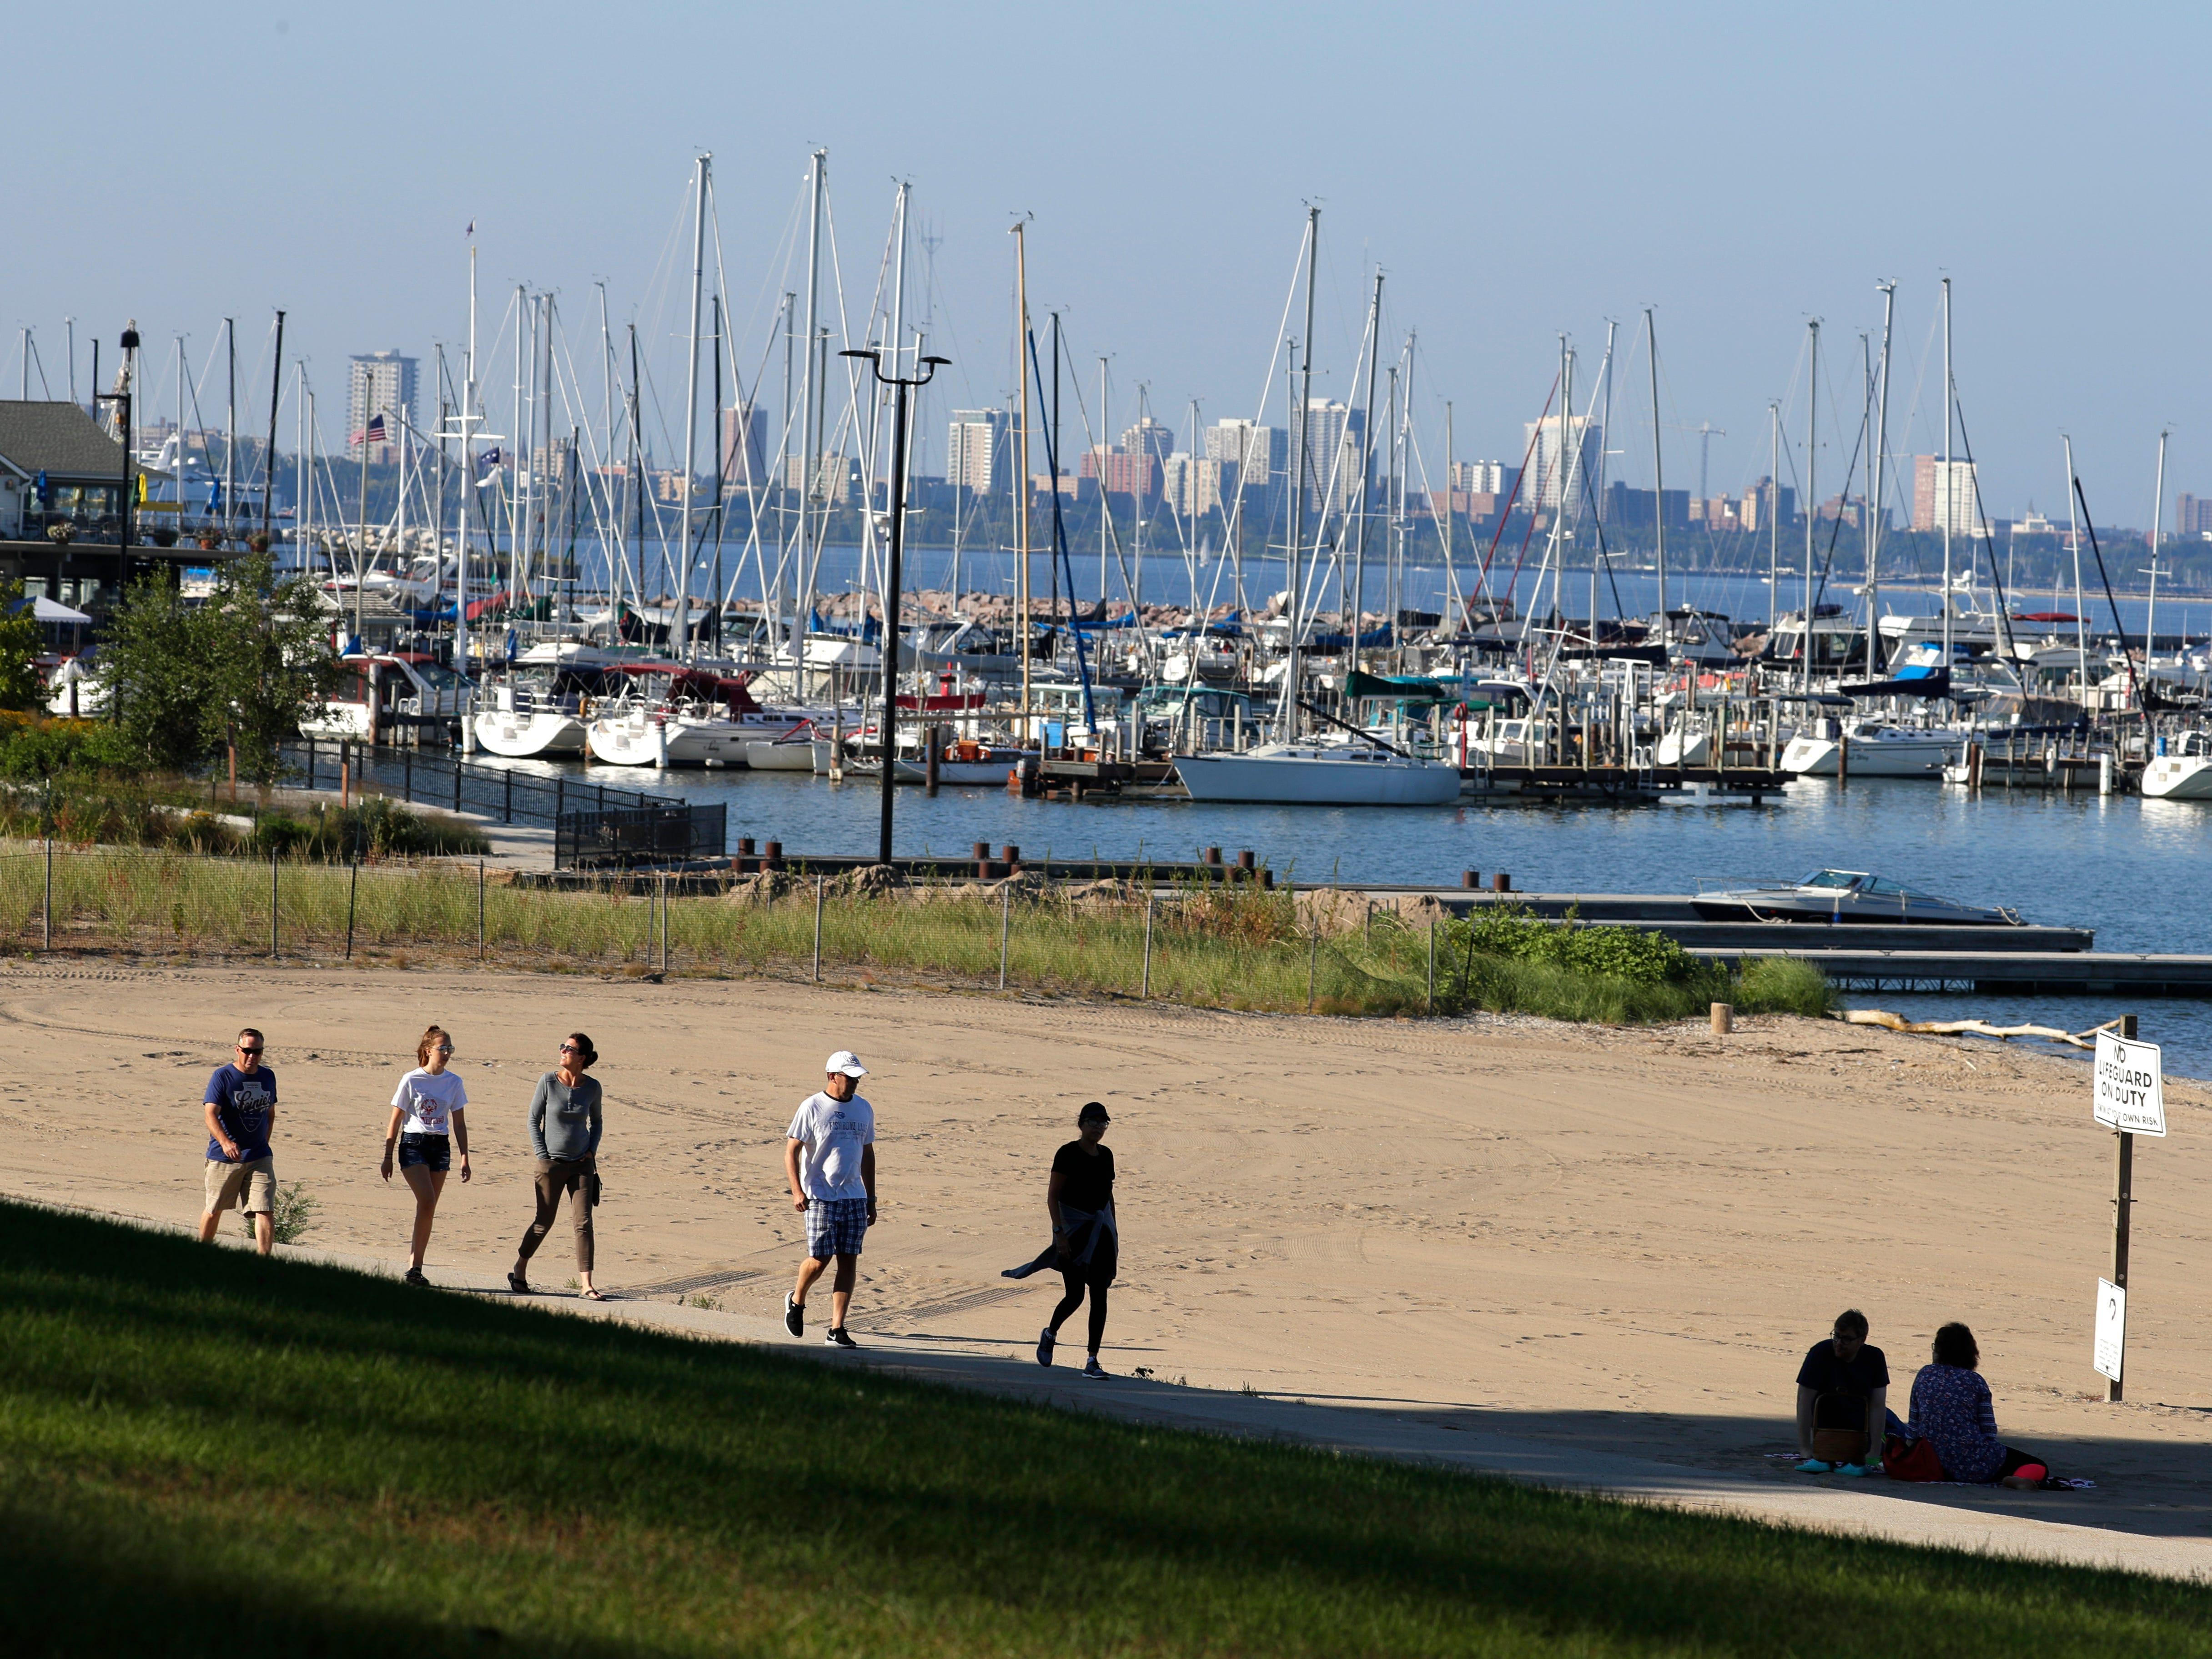 South Shore Park visitors walk past the public beach south of the South Shore Yacht Club.